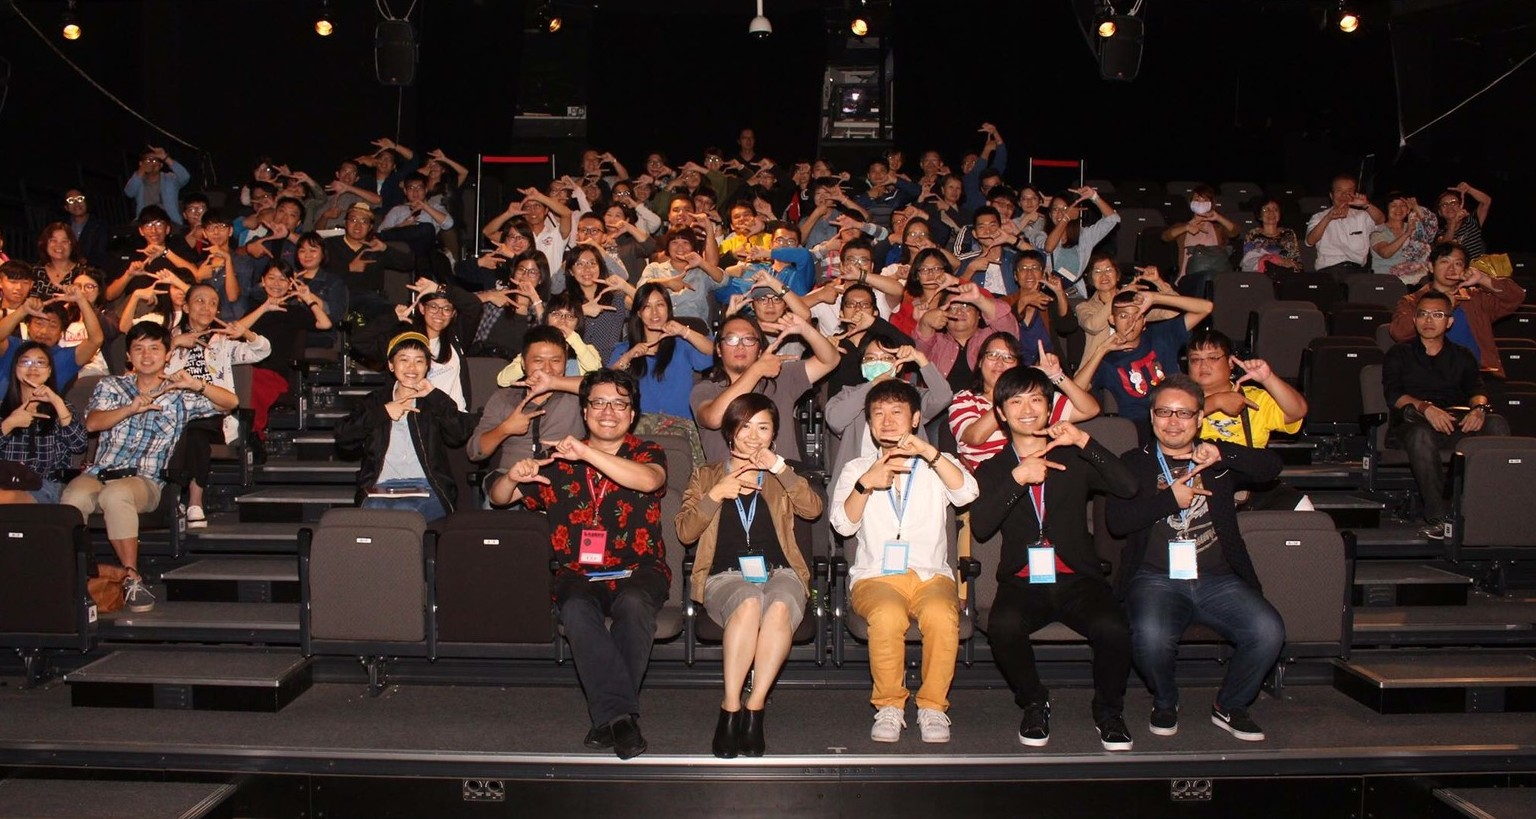 【report】Goshichon Film Festival in Kor